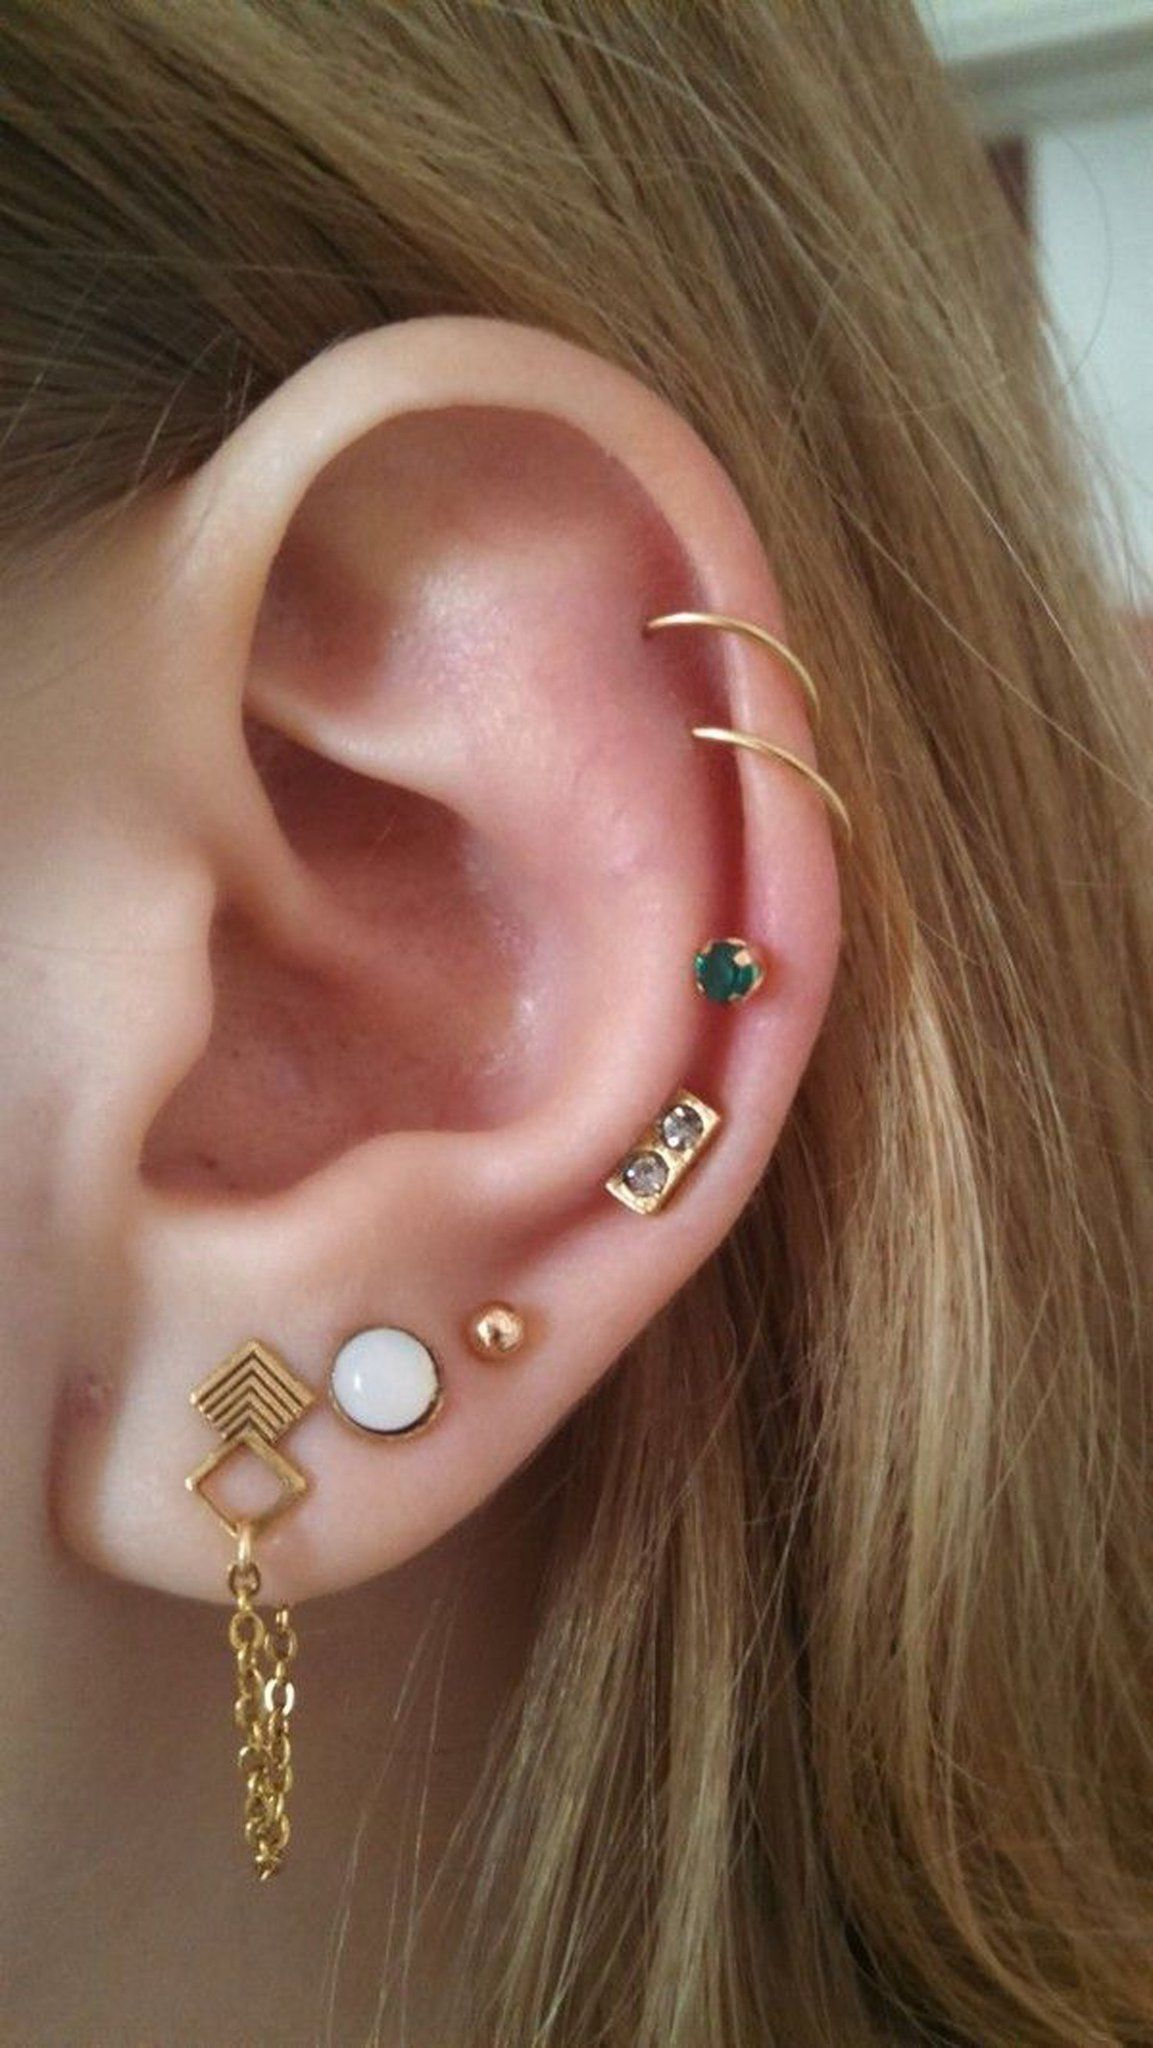 Names for cartilage piercing   Unique Ear Piercing Ideas for the Adventurous  Ear piercings